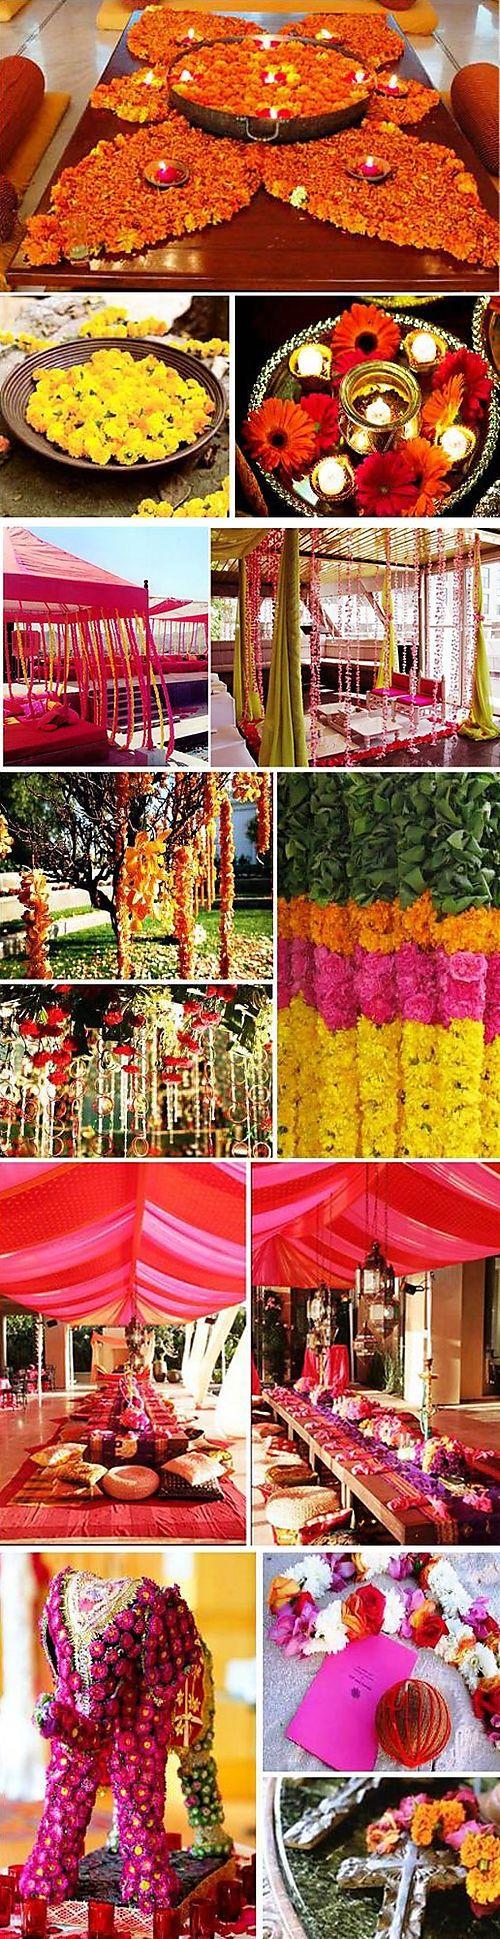 #Beautiful #Bollywood #Style #Indian #wedding #bride #marriage #shadi #groom #india #RED #love #redlengha #punjabistyle #cute #flowers #mandap